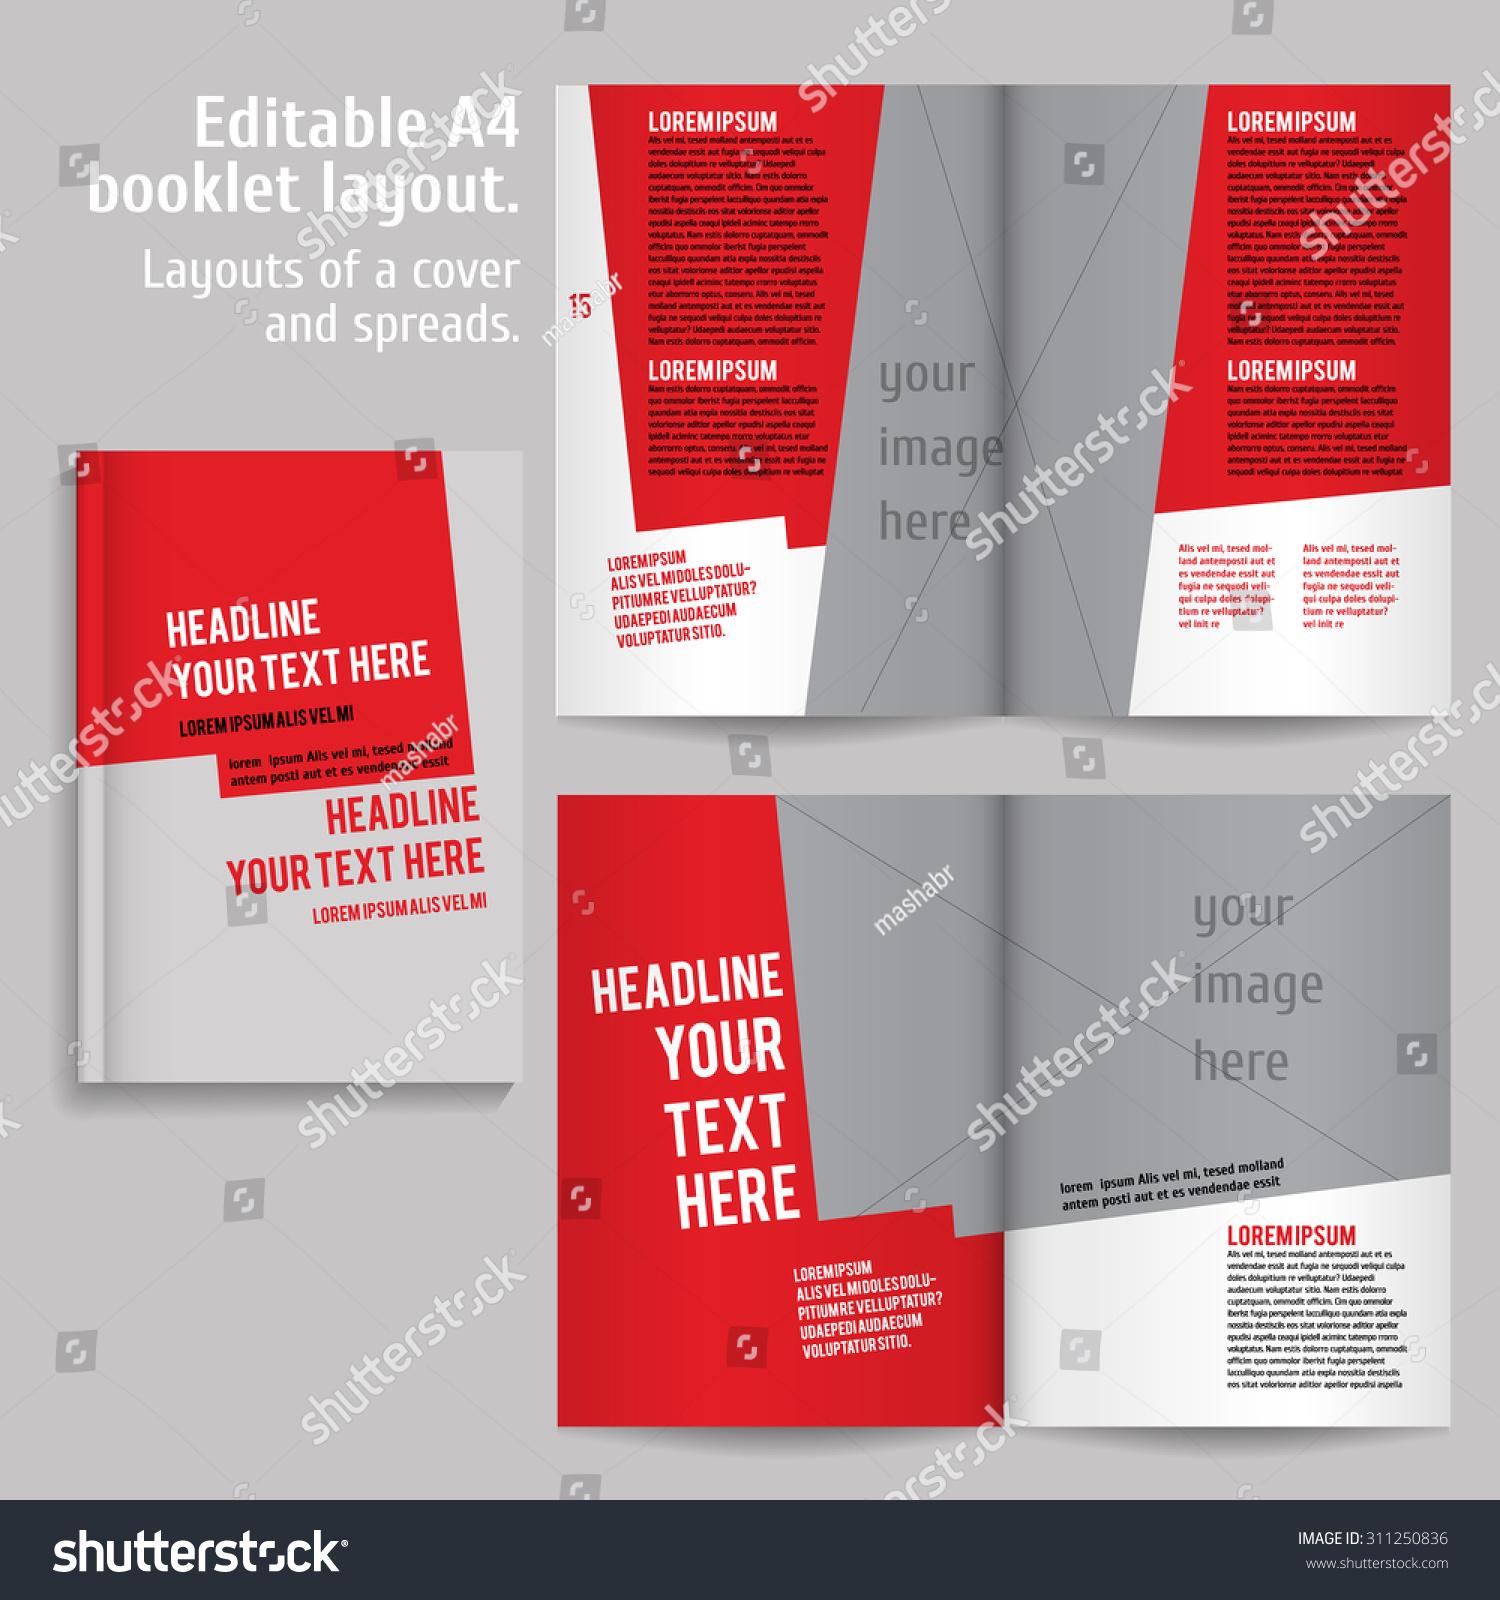 free magazine templates for microsoft word